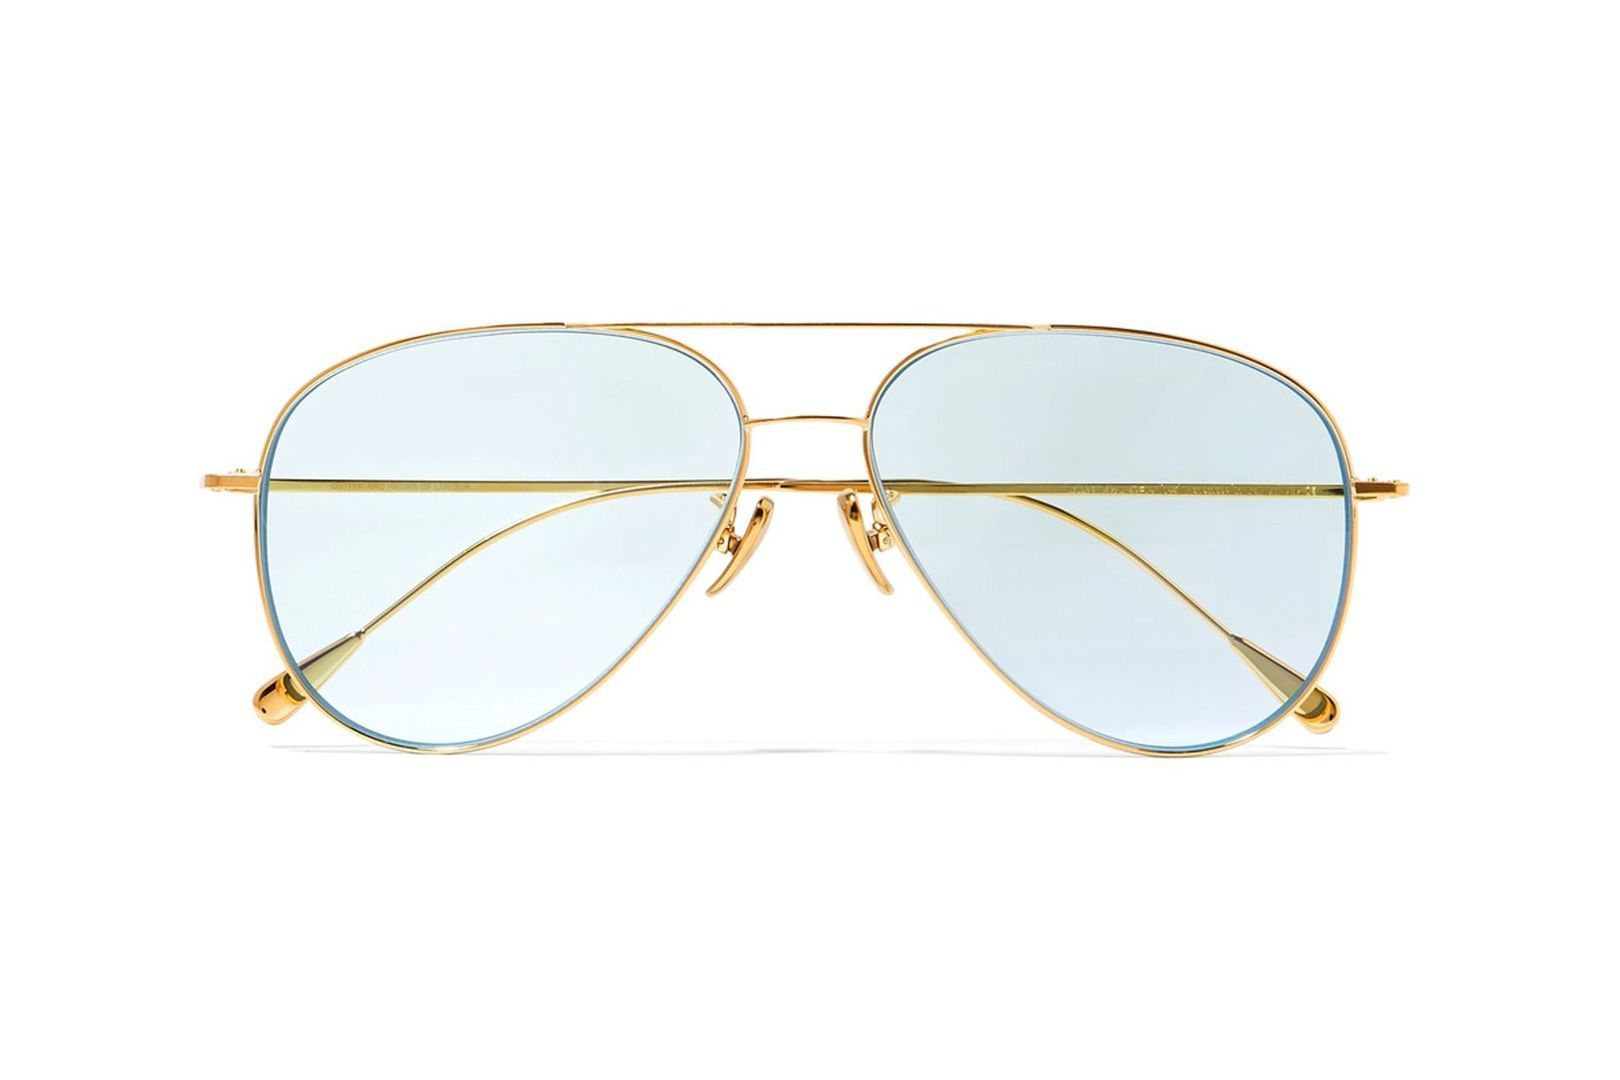 "Aviator-style gold-tone sunglasses, £435 at [link url=""https://www.net-a-porter.com/gb/en/product/955625/cutler_and_gross/aviator-style-gold-tone-sunglasses""]Net-a-porter.com[/link]."